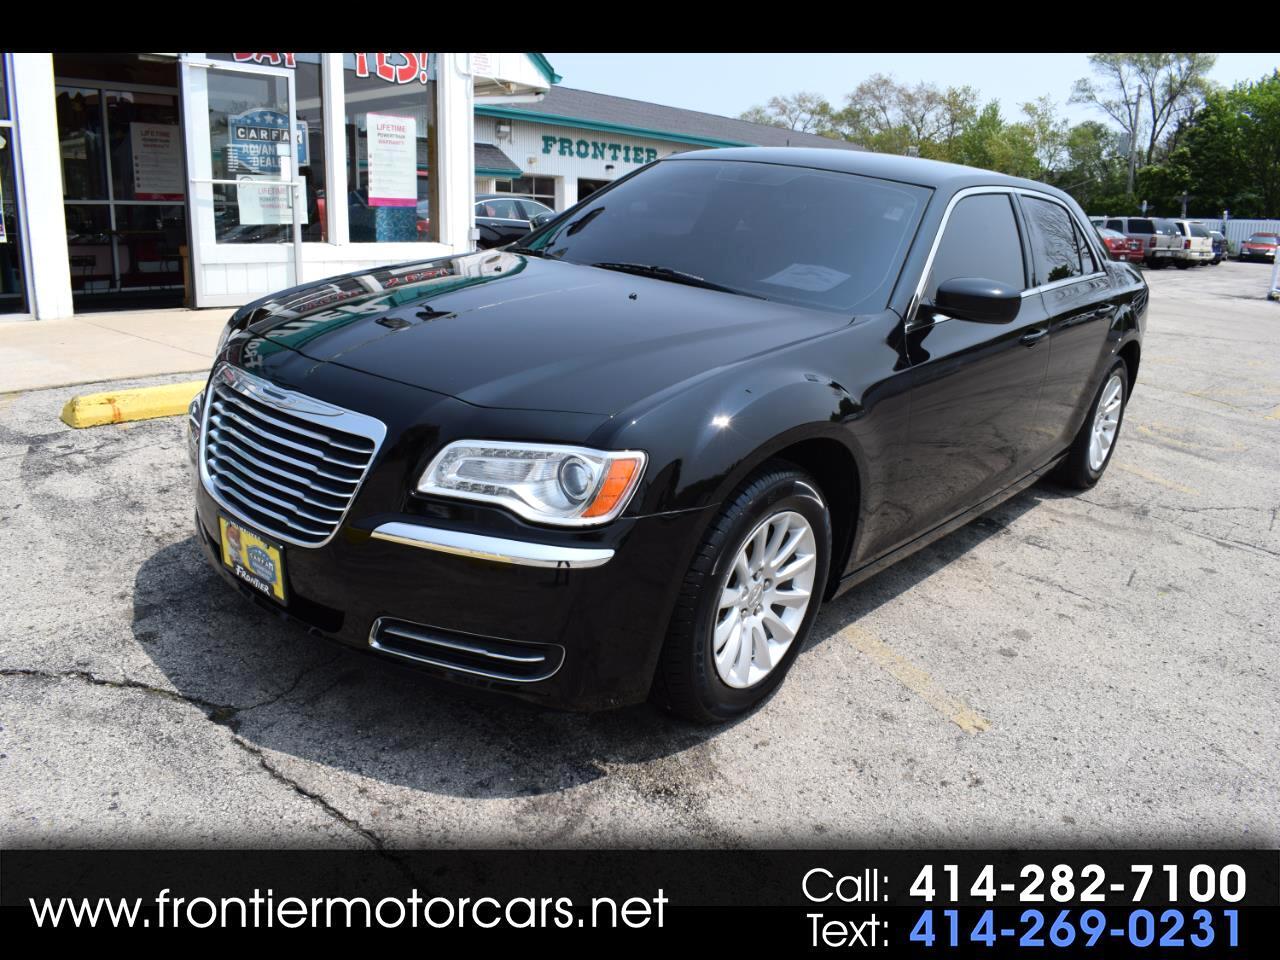 2013 Chrysler 300 4dr Sdn RWD